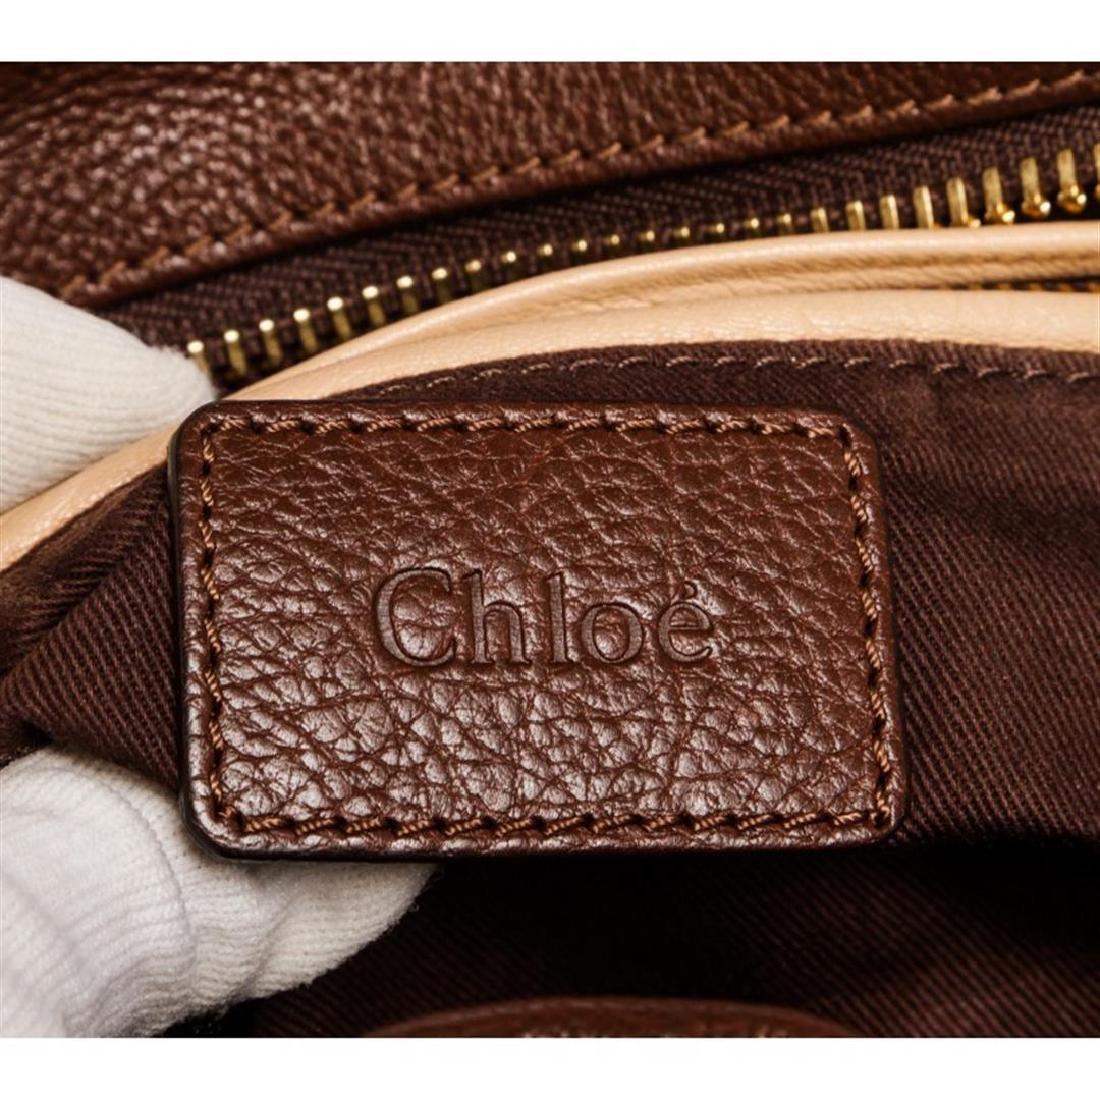 Chloe Brown Leather Paraty Medium Satchel Handbag - 6